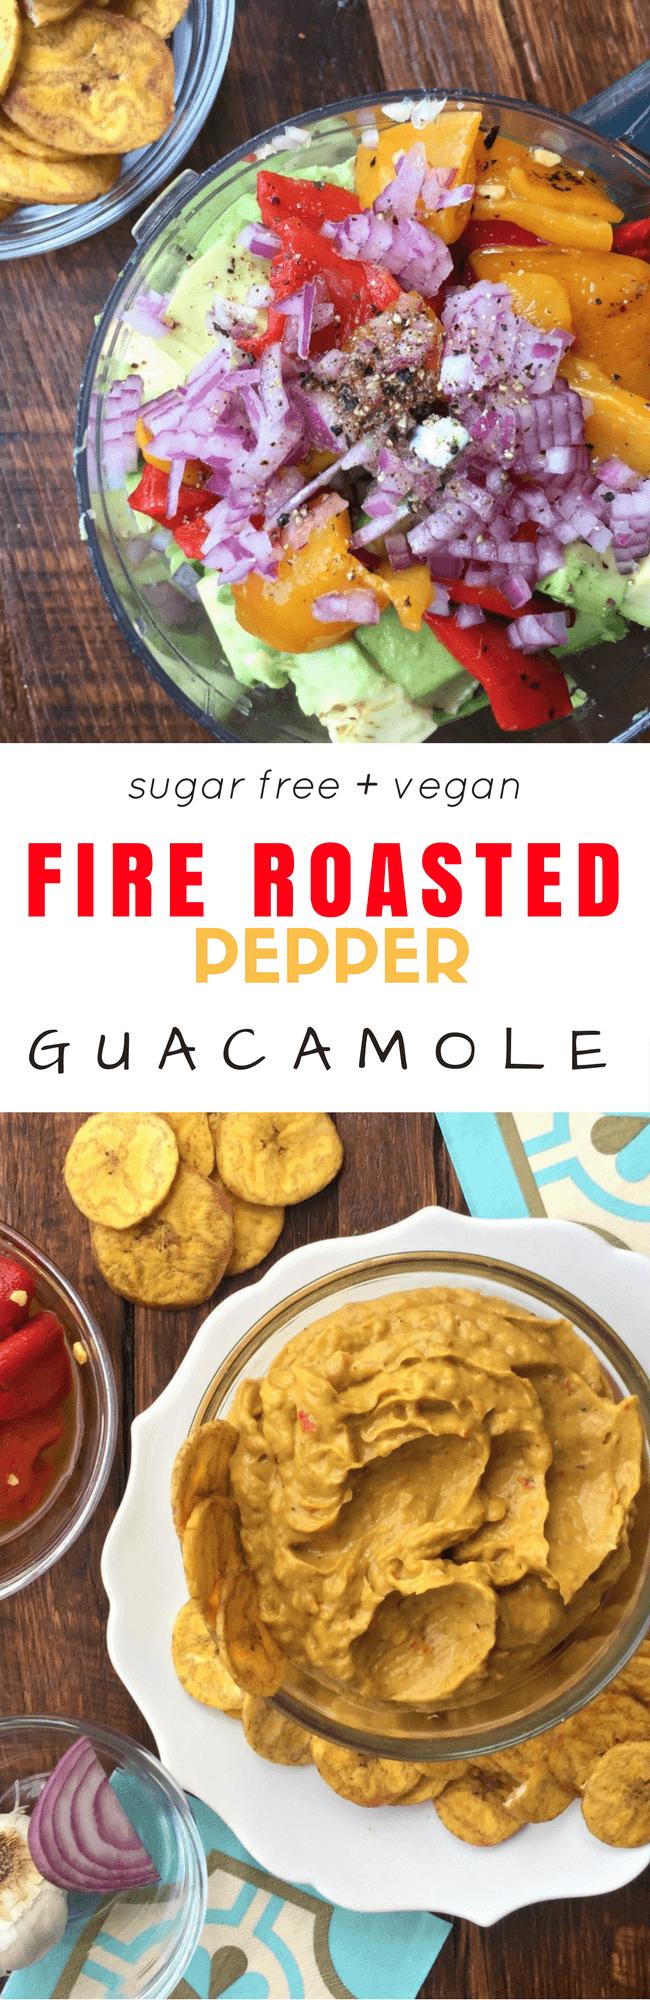 Fire Roasted Pepper Guacamole | Personally Paleo